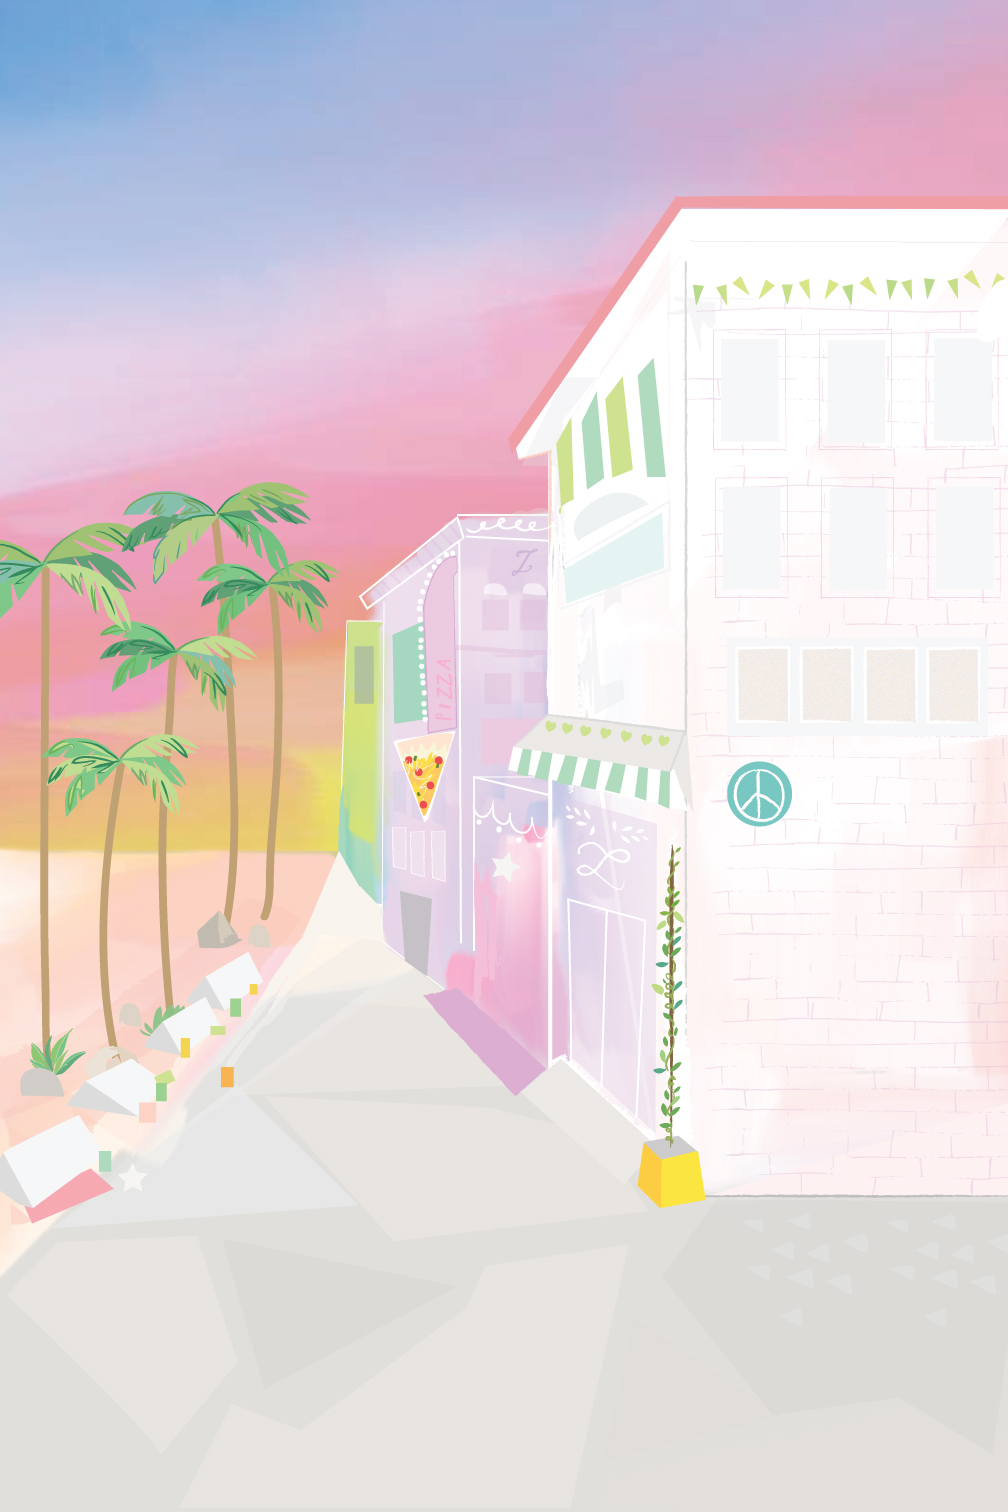 Venice-Illustration-WEB4.jpg